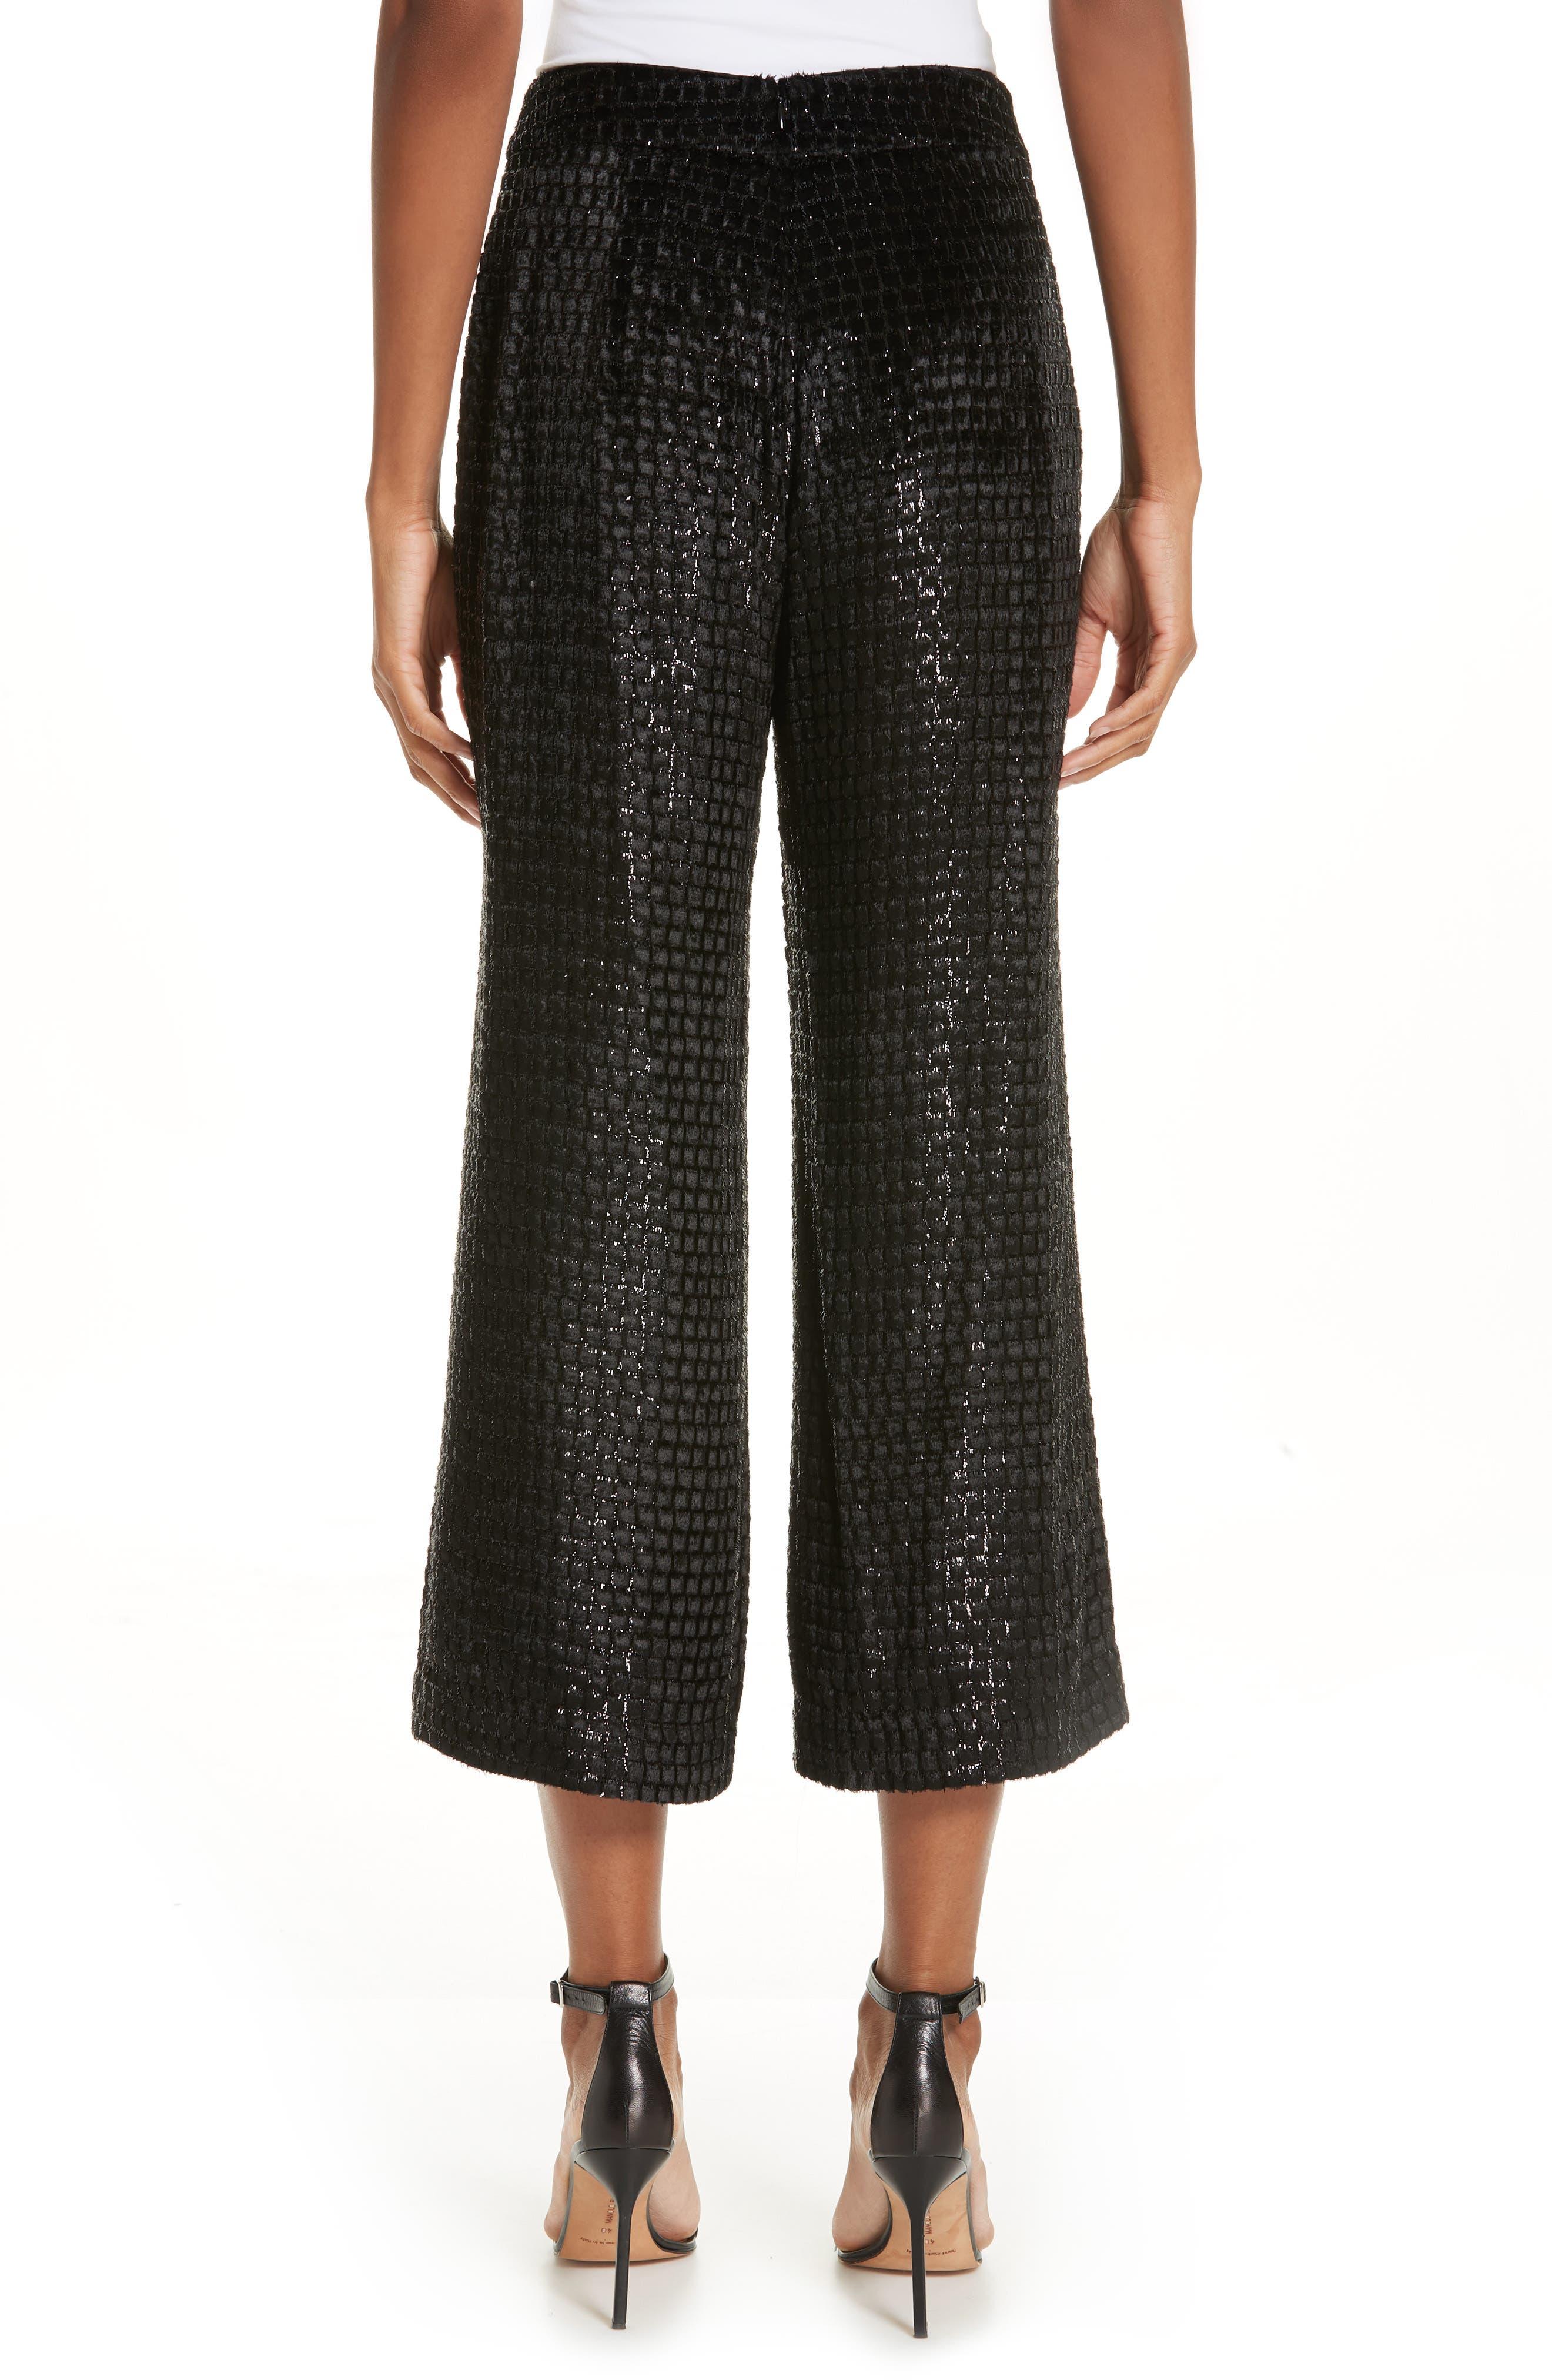 BRANDON MAXWELL, Metallic Velvet Crop Wide Leg Pants, Alternate thumbnail 2, color, BLACK